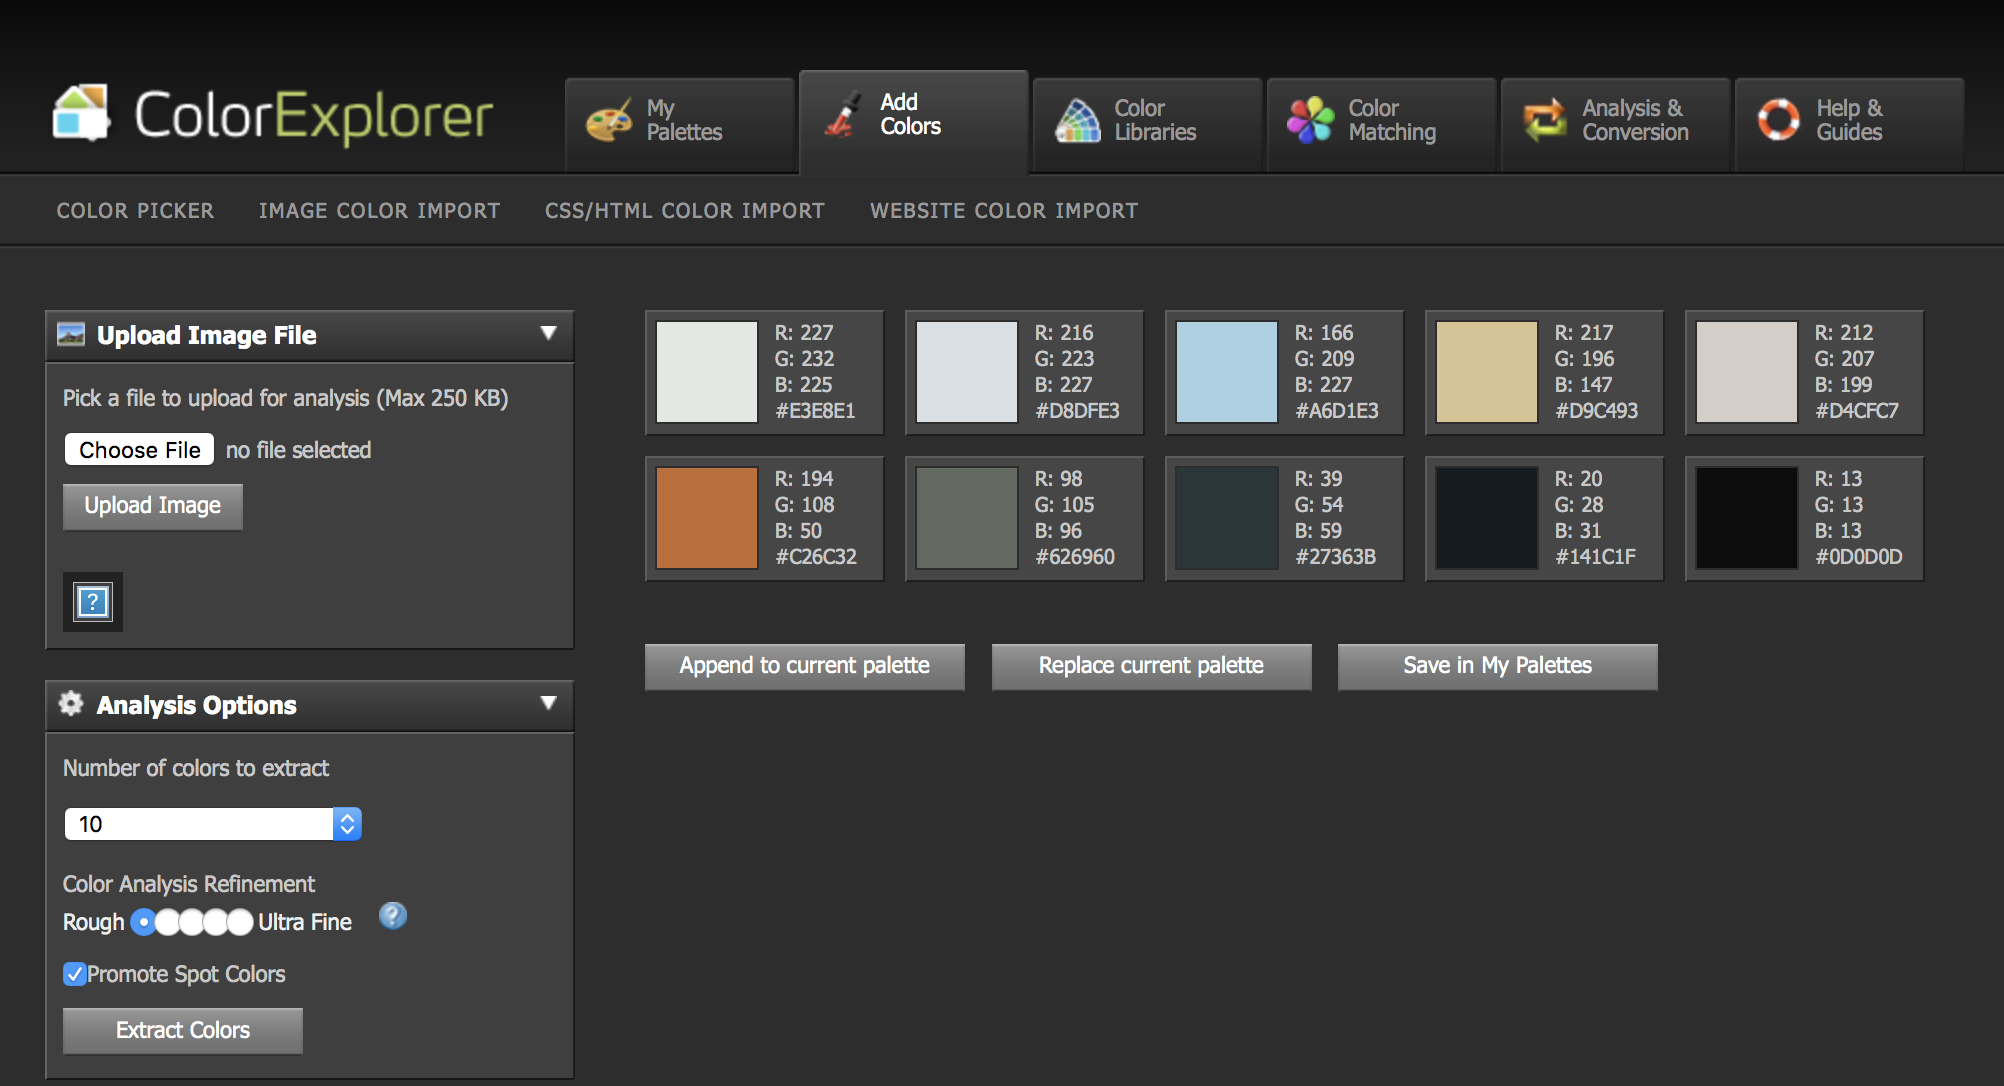 ColorExplorer interface